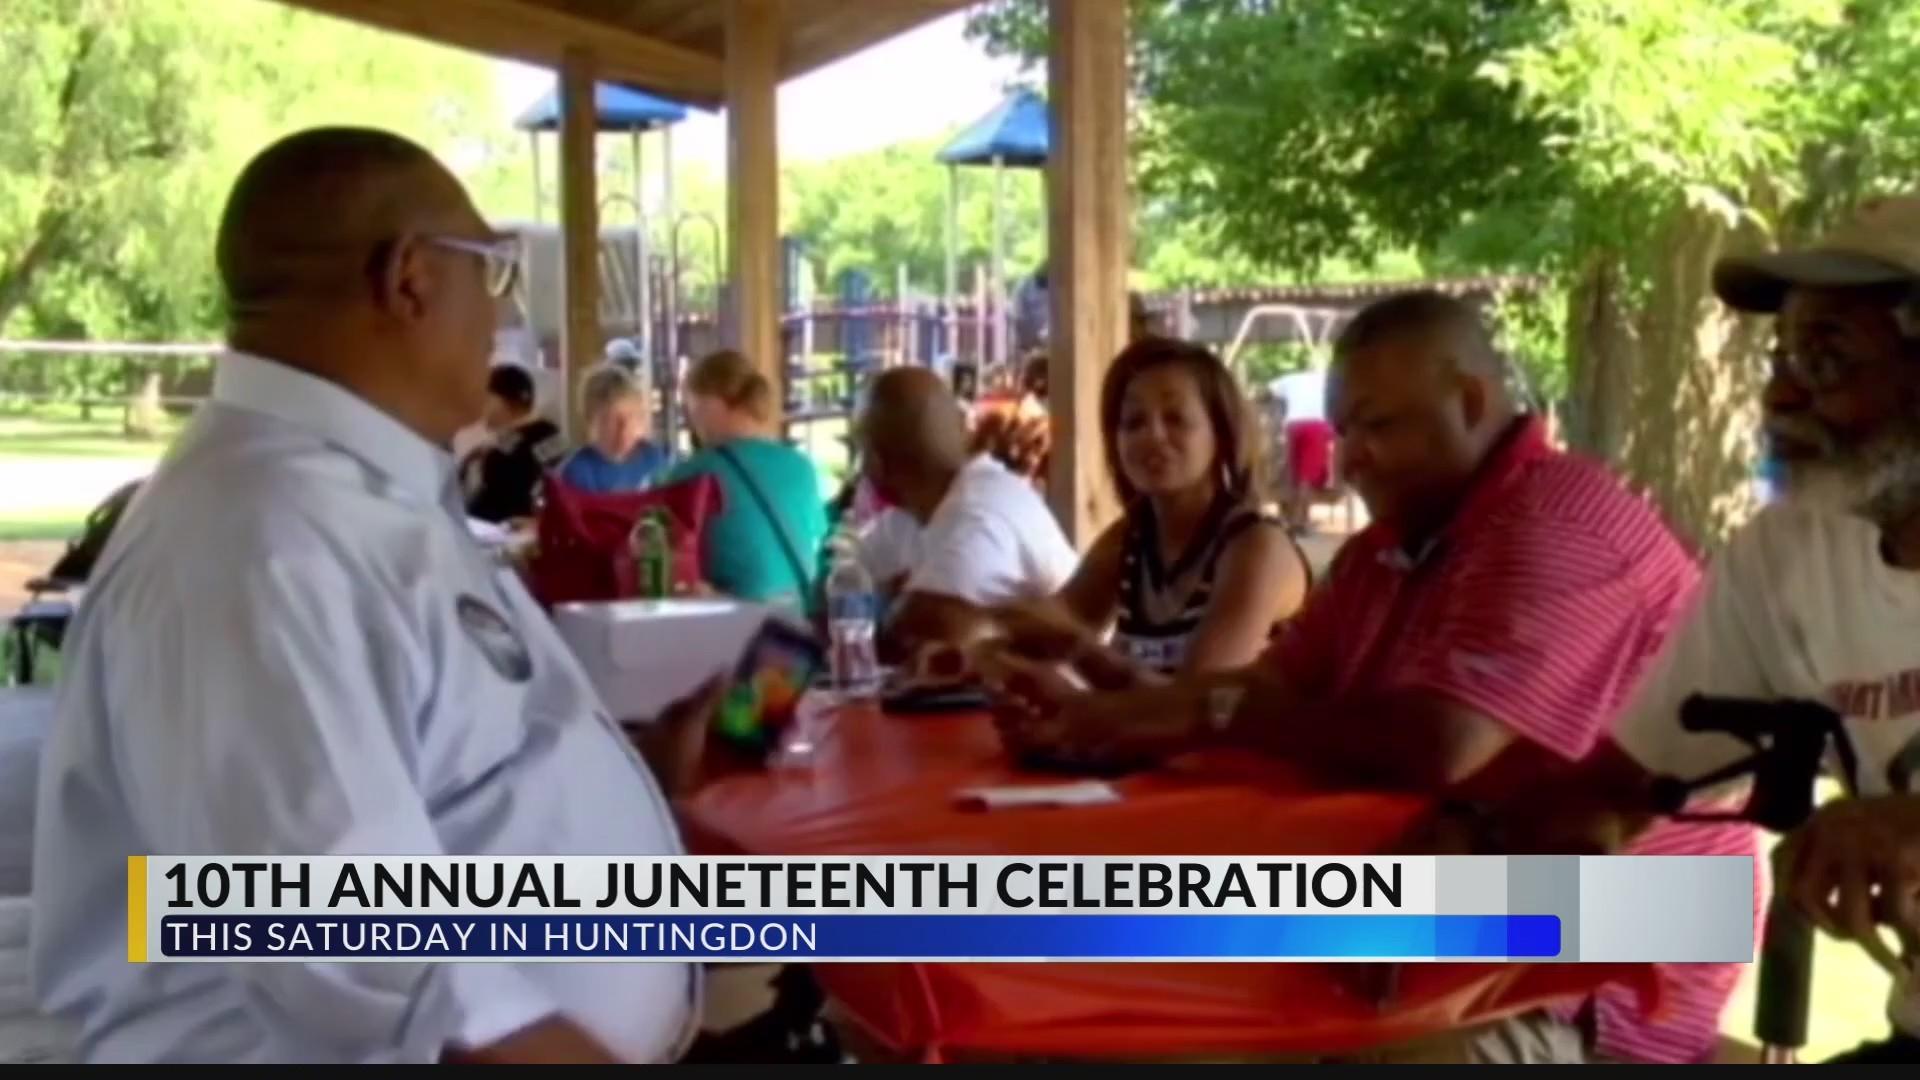 10th Annual Juneteenth Celebration